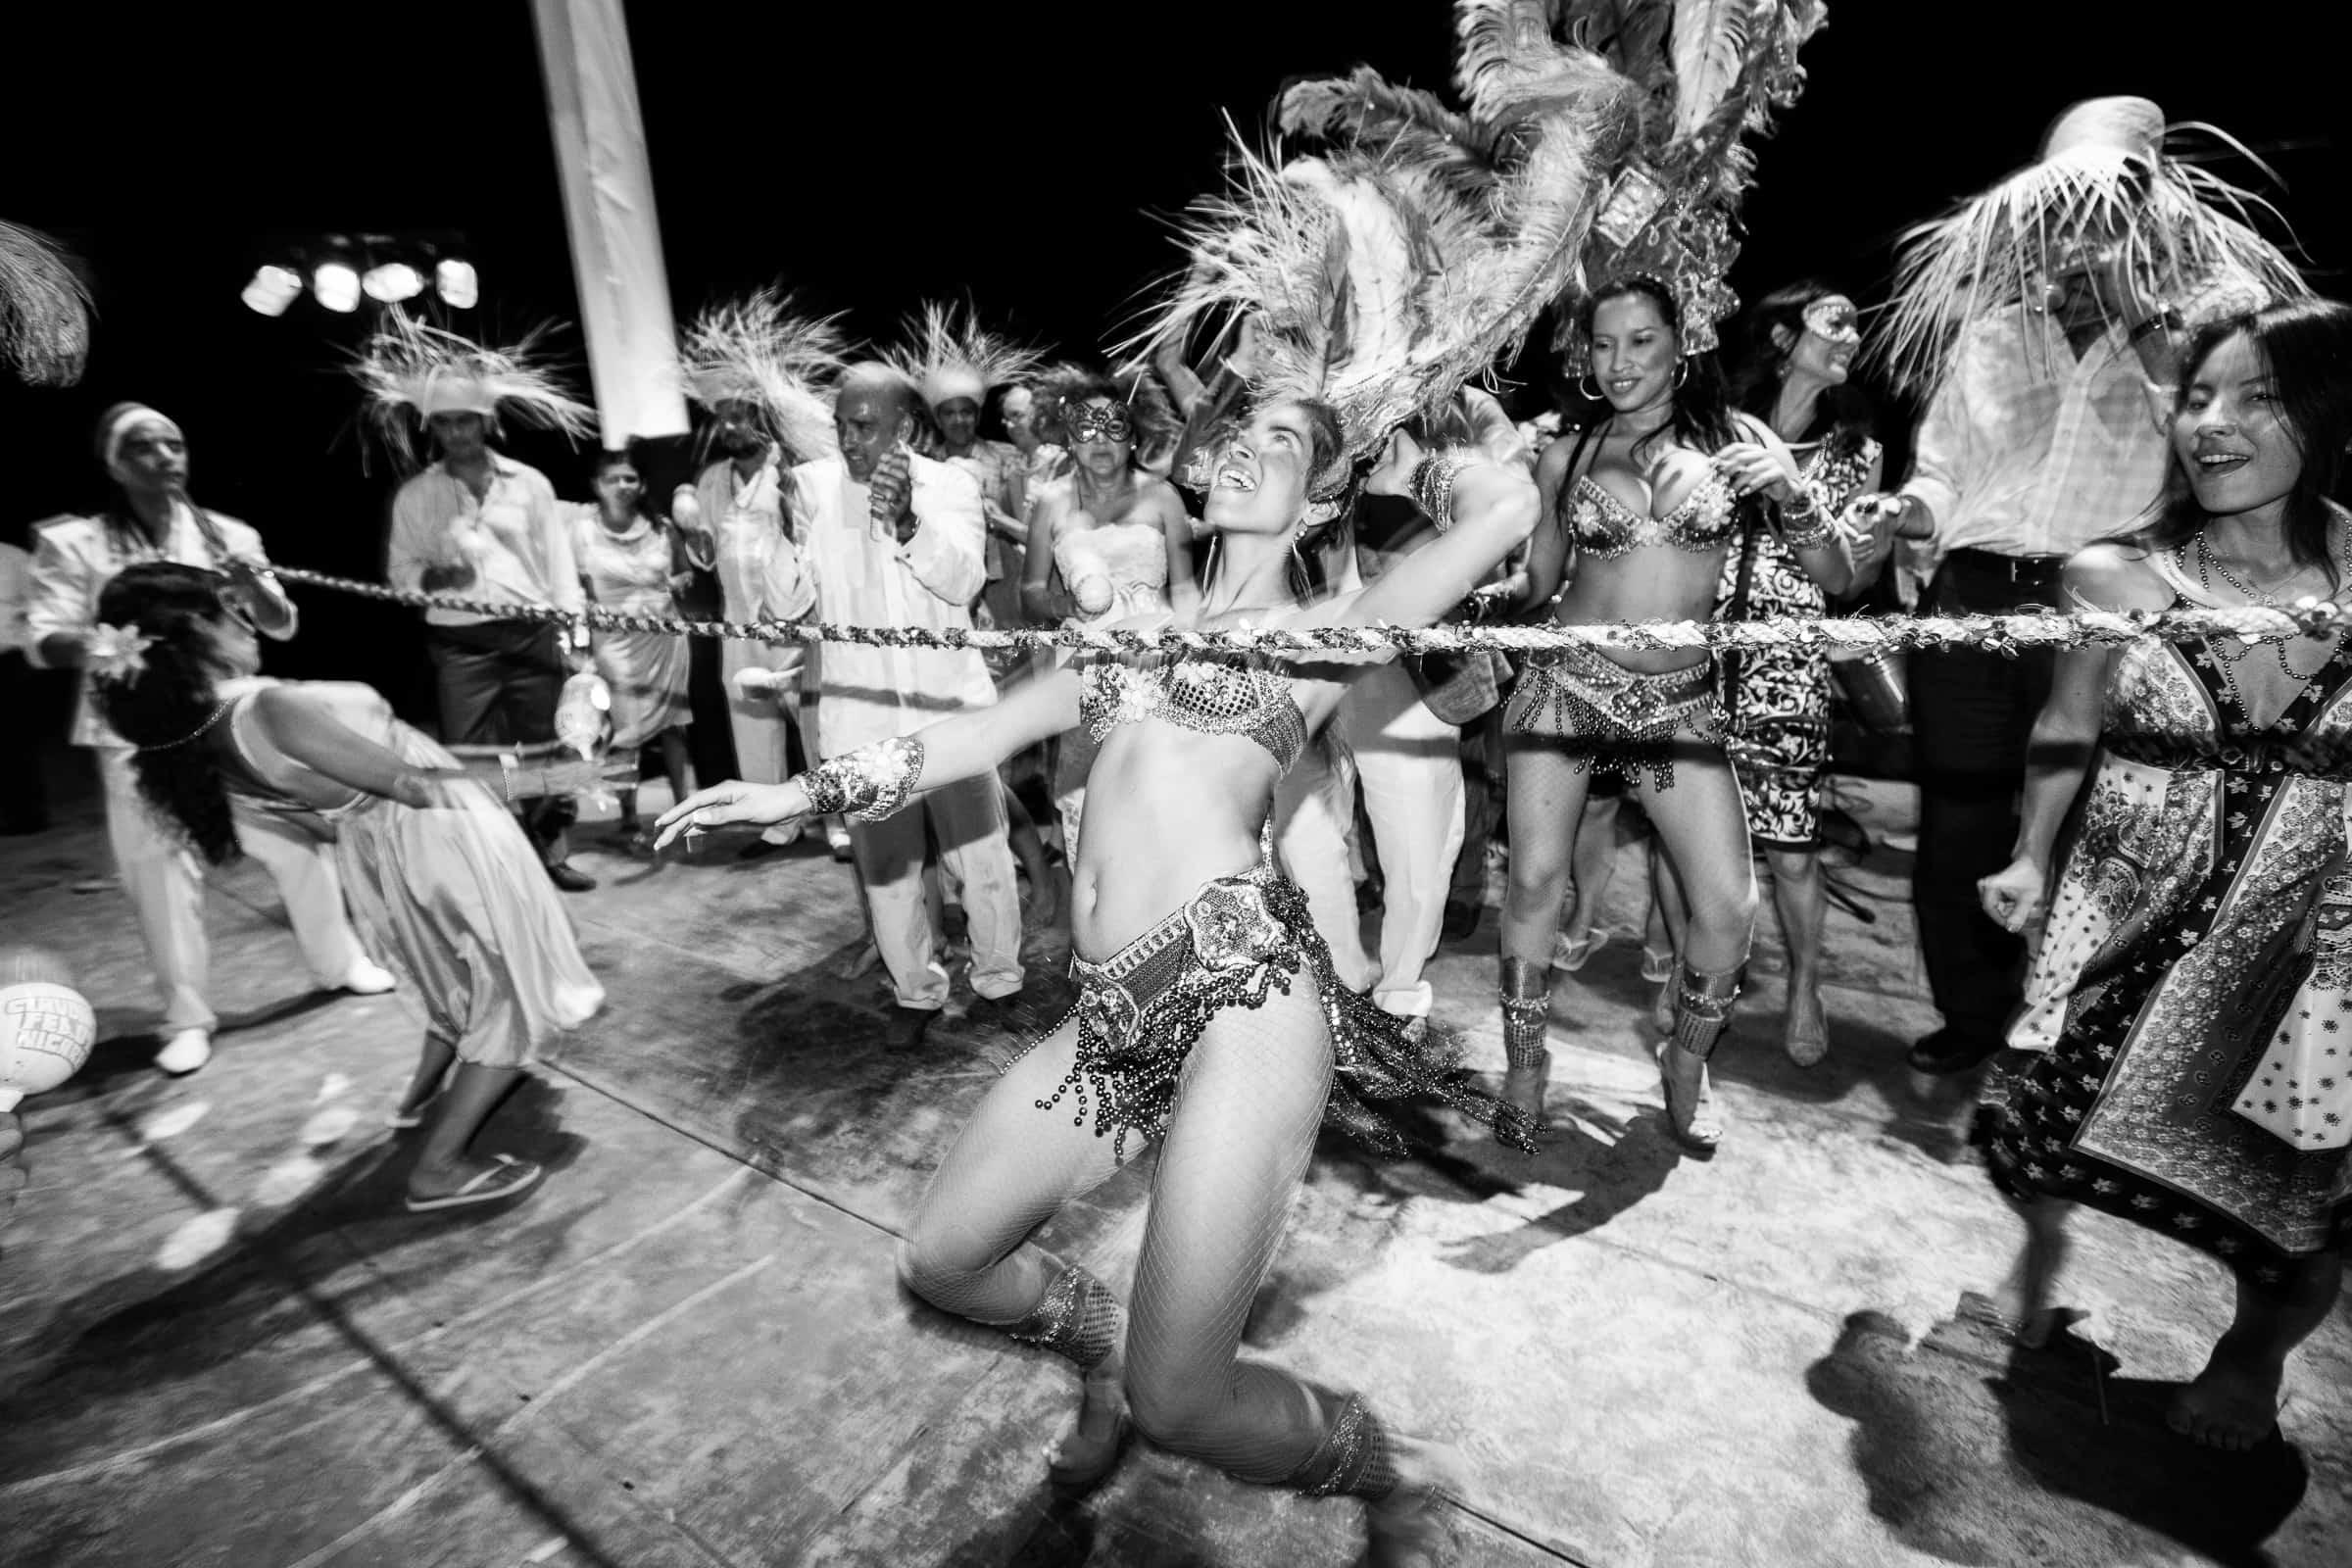 carnival dancers limbo